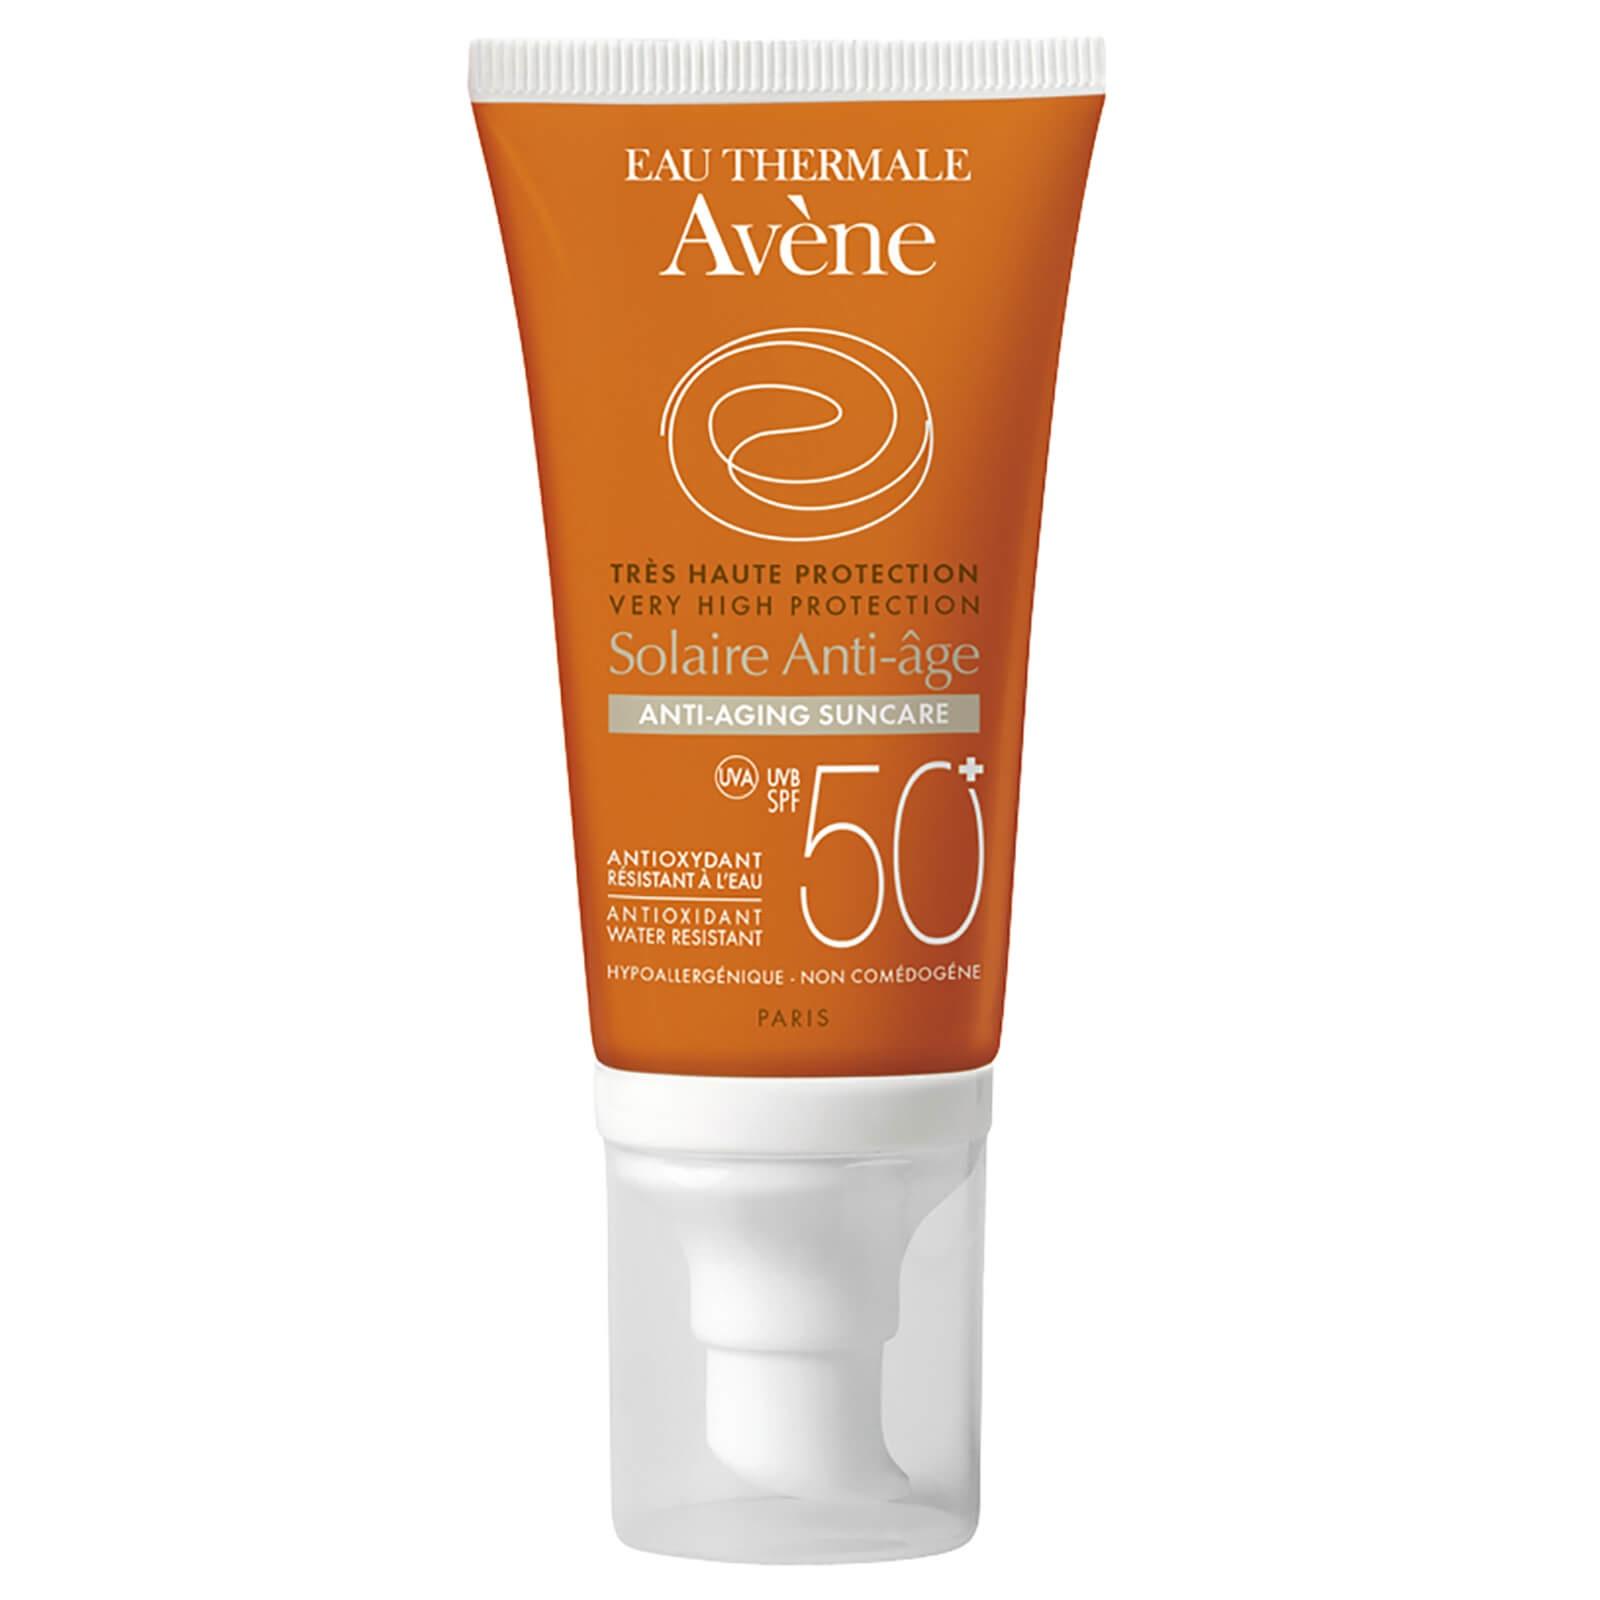 Avene Very High Protection Anti-Ageing Suncare SPF50+ 50ml